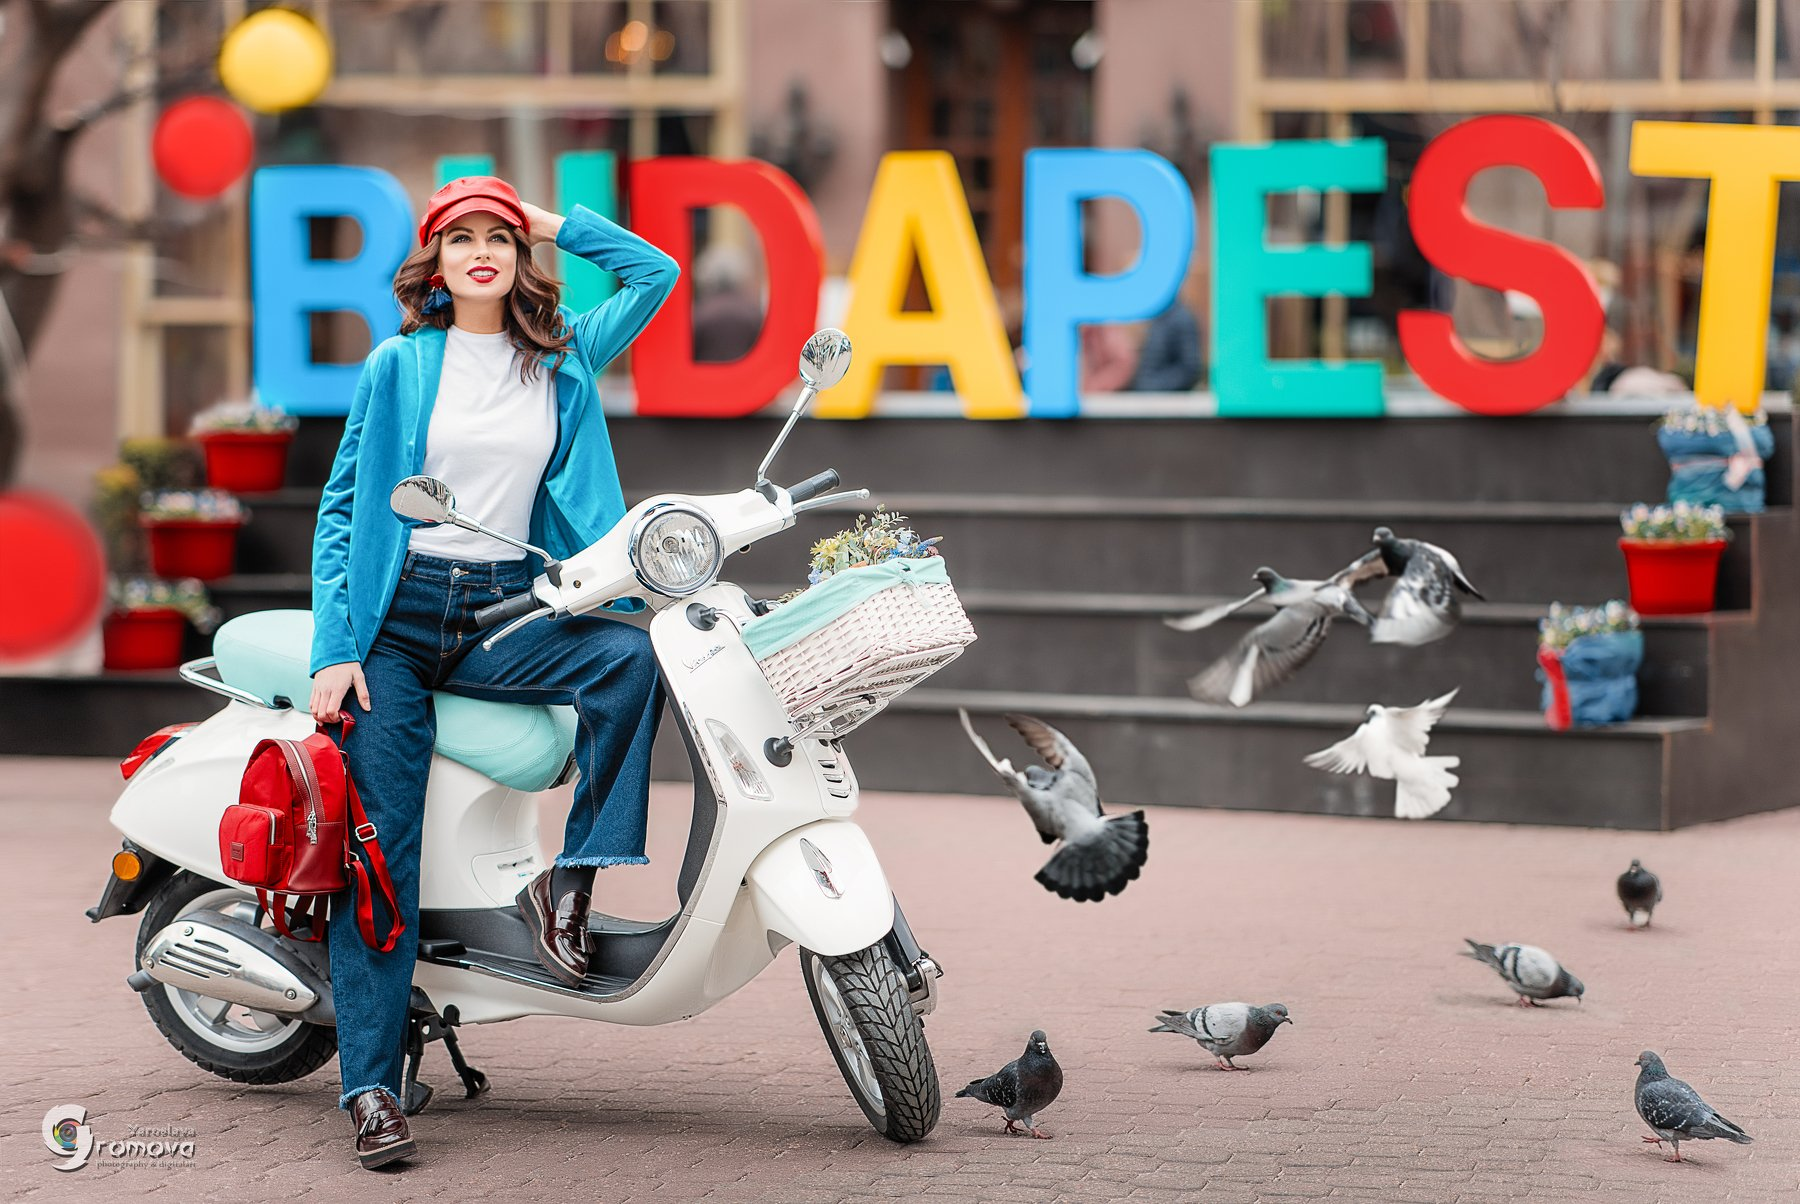 девушка, мопед, мотобайк, площадь, голуби, Будапешт, путешествие, Ярослава Громова